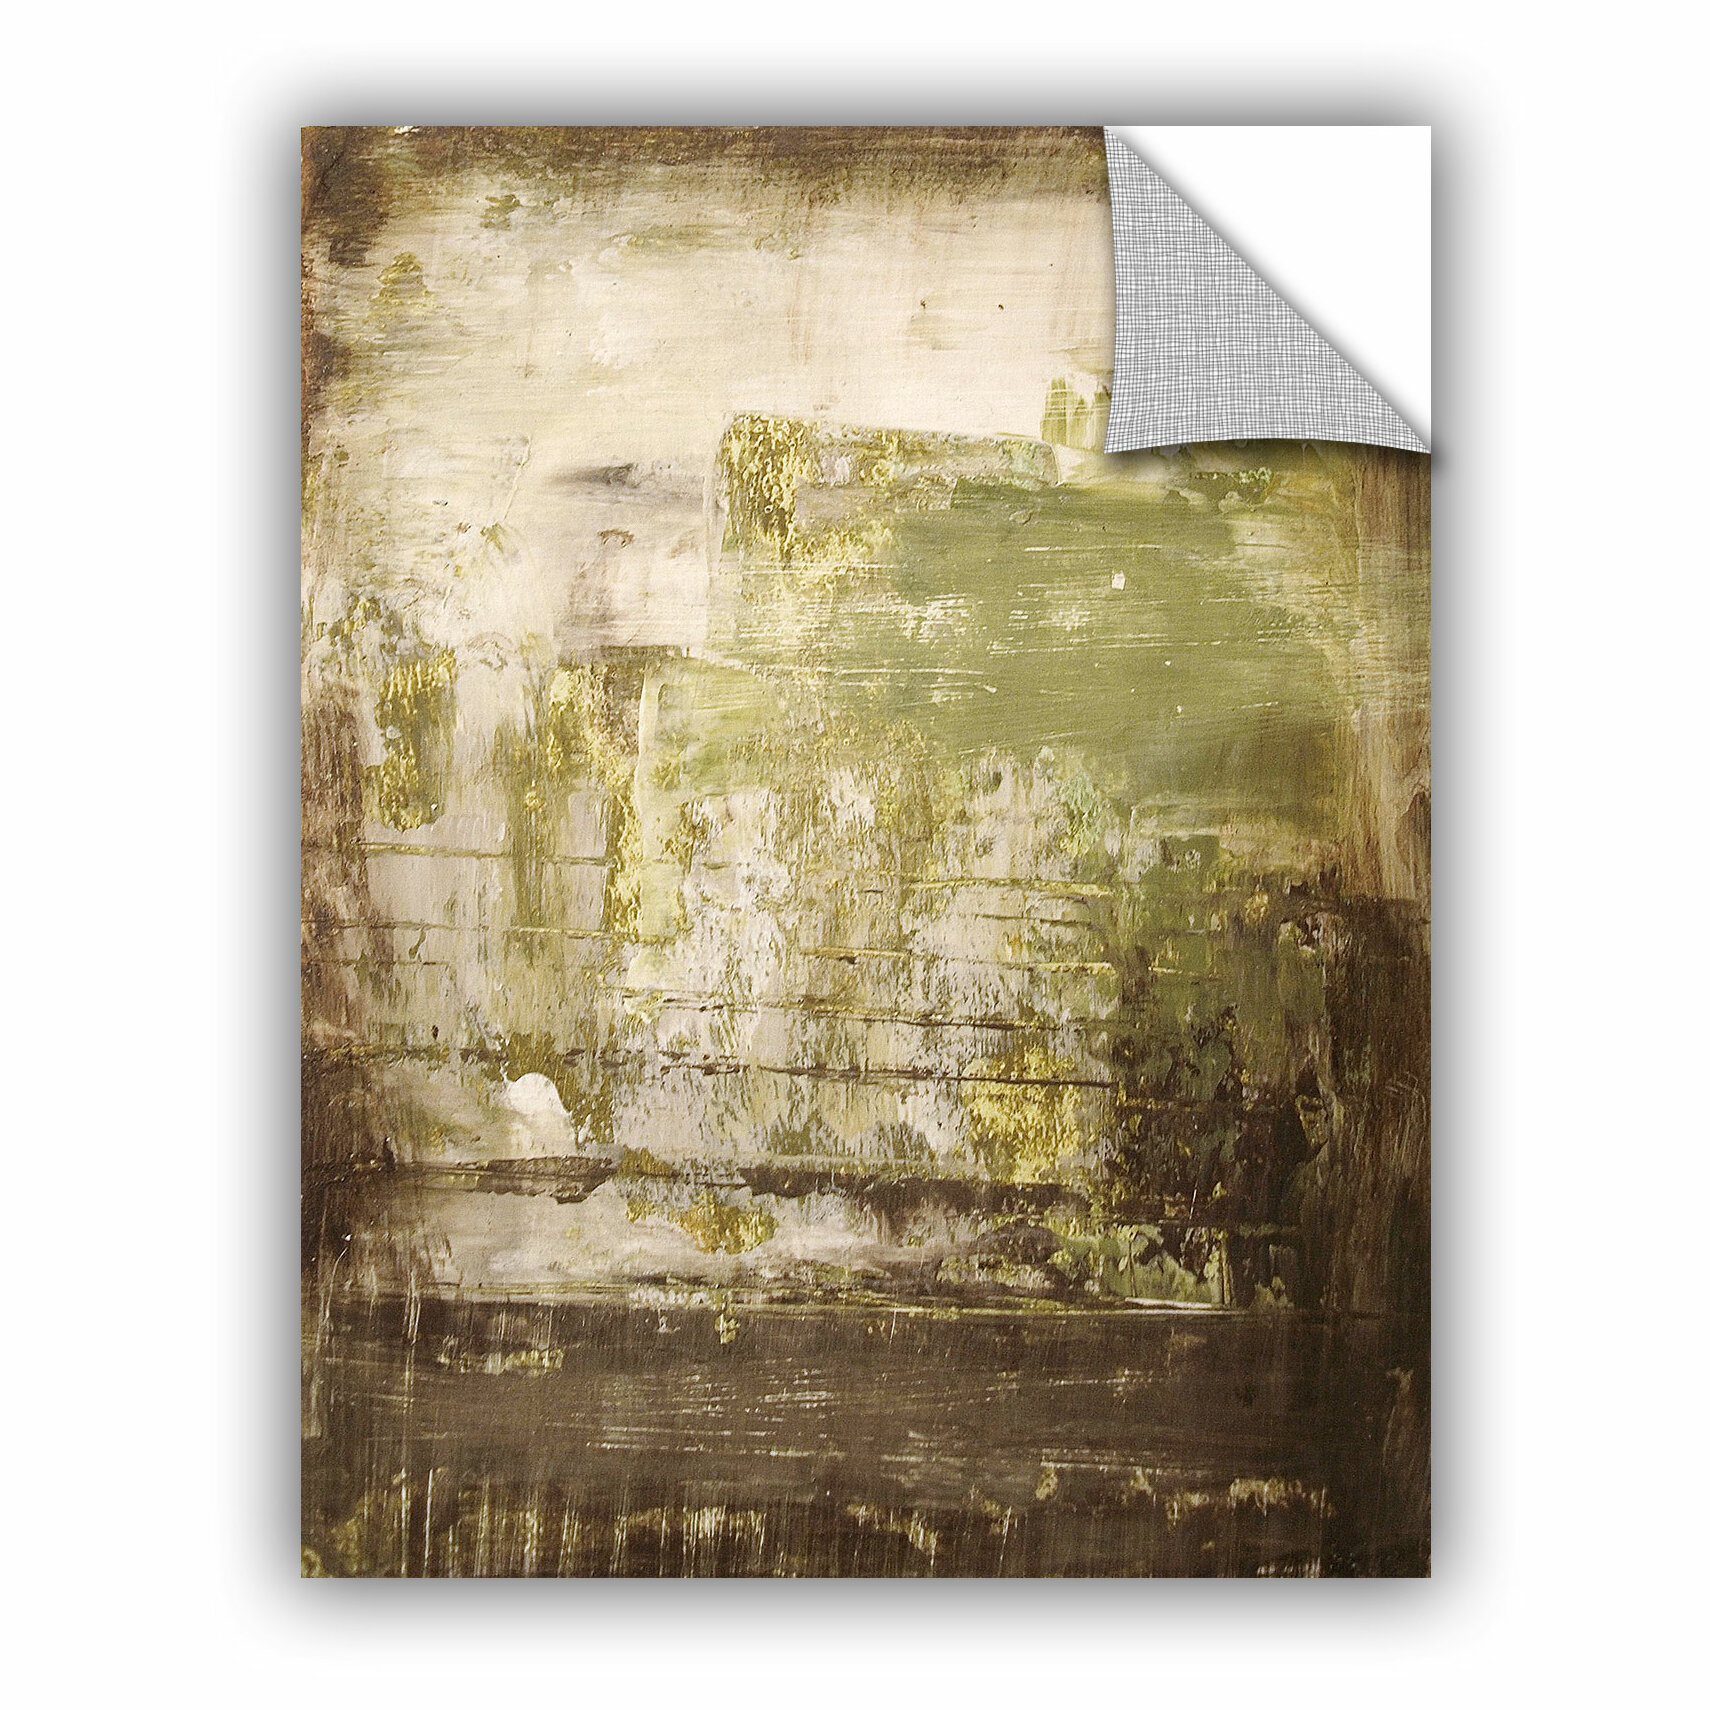 Williston Forge Mcdowell Moss Wall Decal | Wayfair